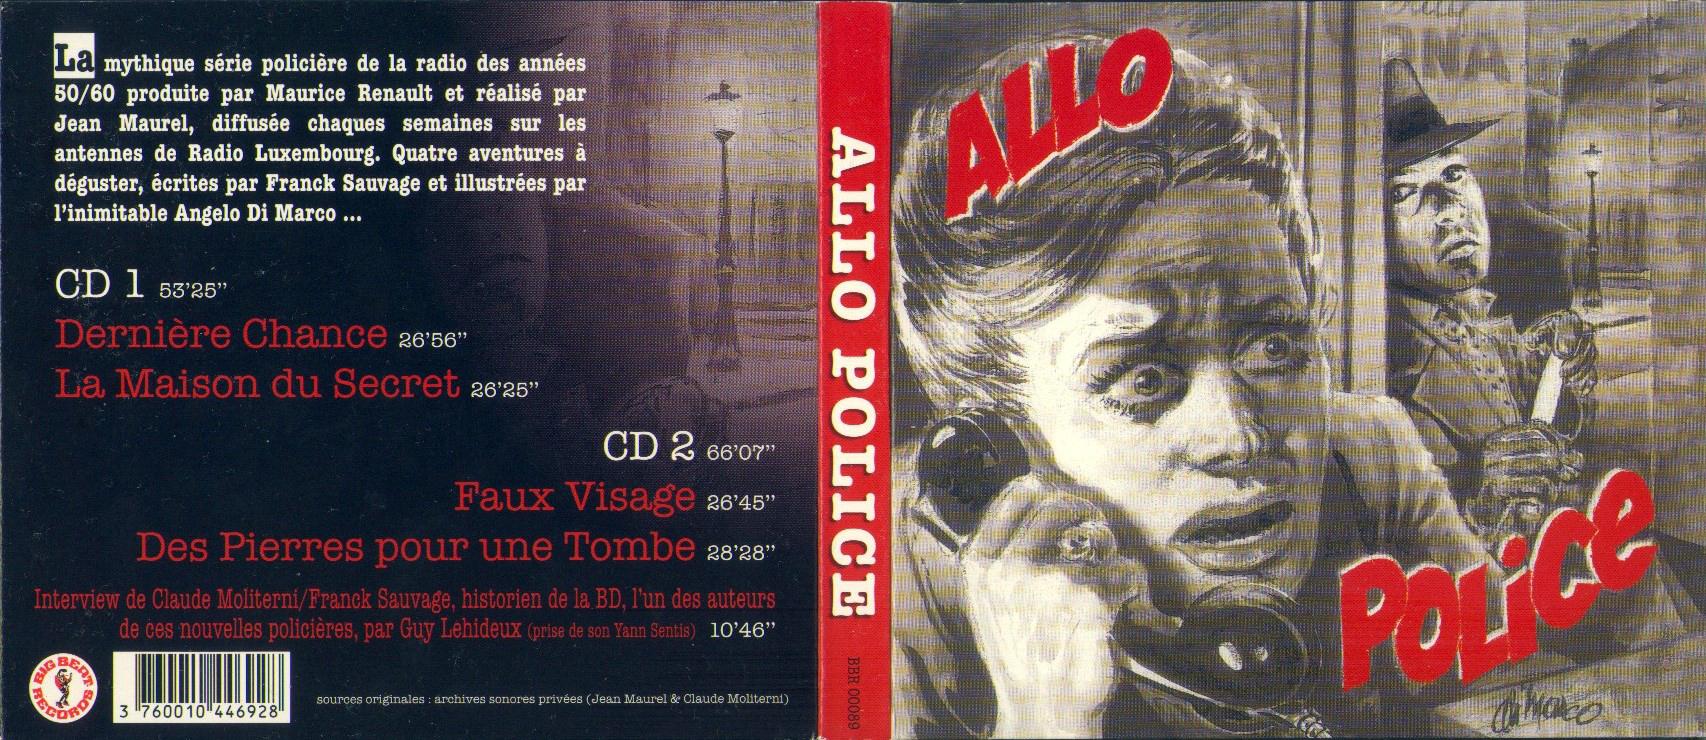 (pièce radio) ALLO... POLICE ! - 4 épisodes (1956 à 1960) [MP3 160kbps]